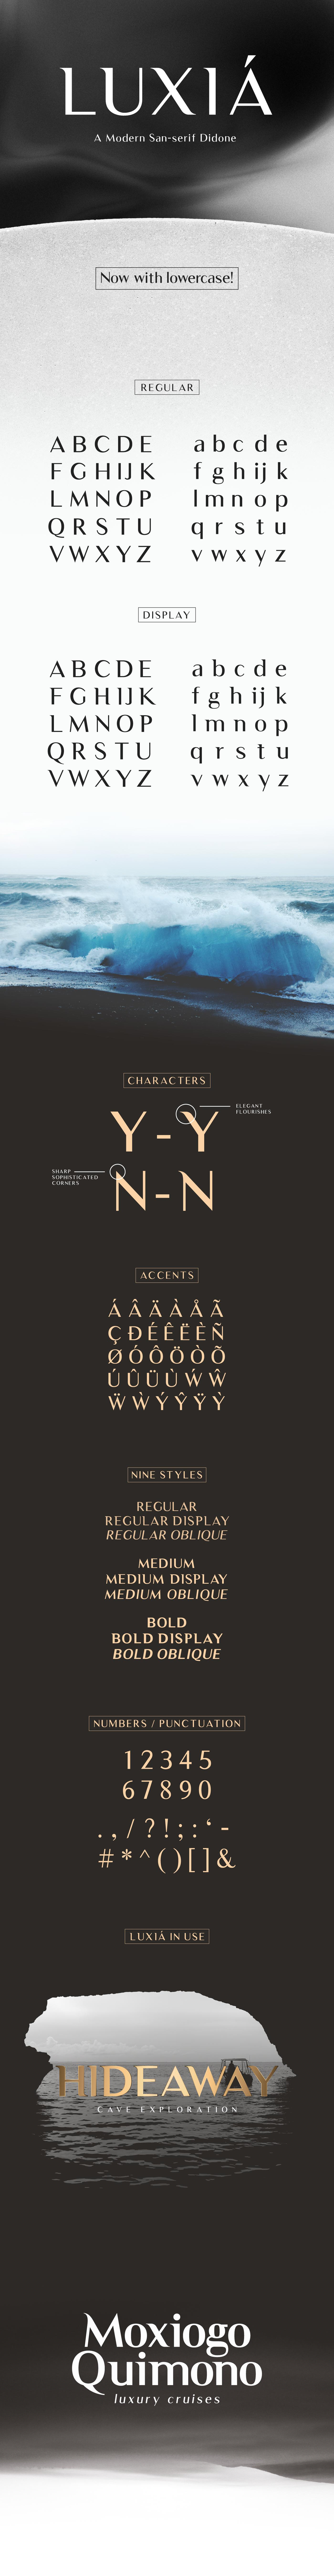 Luxia San-Serif serif Didone luxury font Typeface free elegant download Andrew Herndon new logo design Ocean